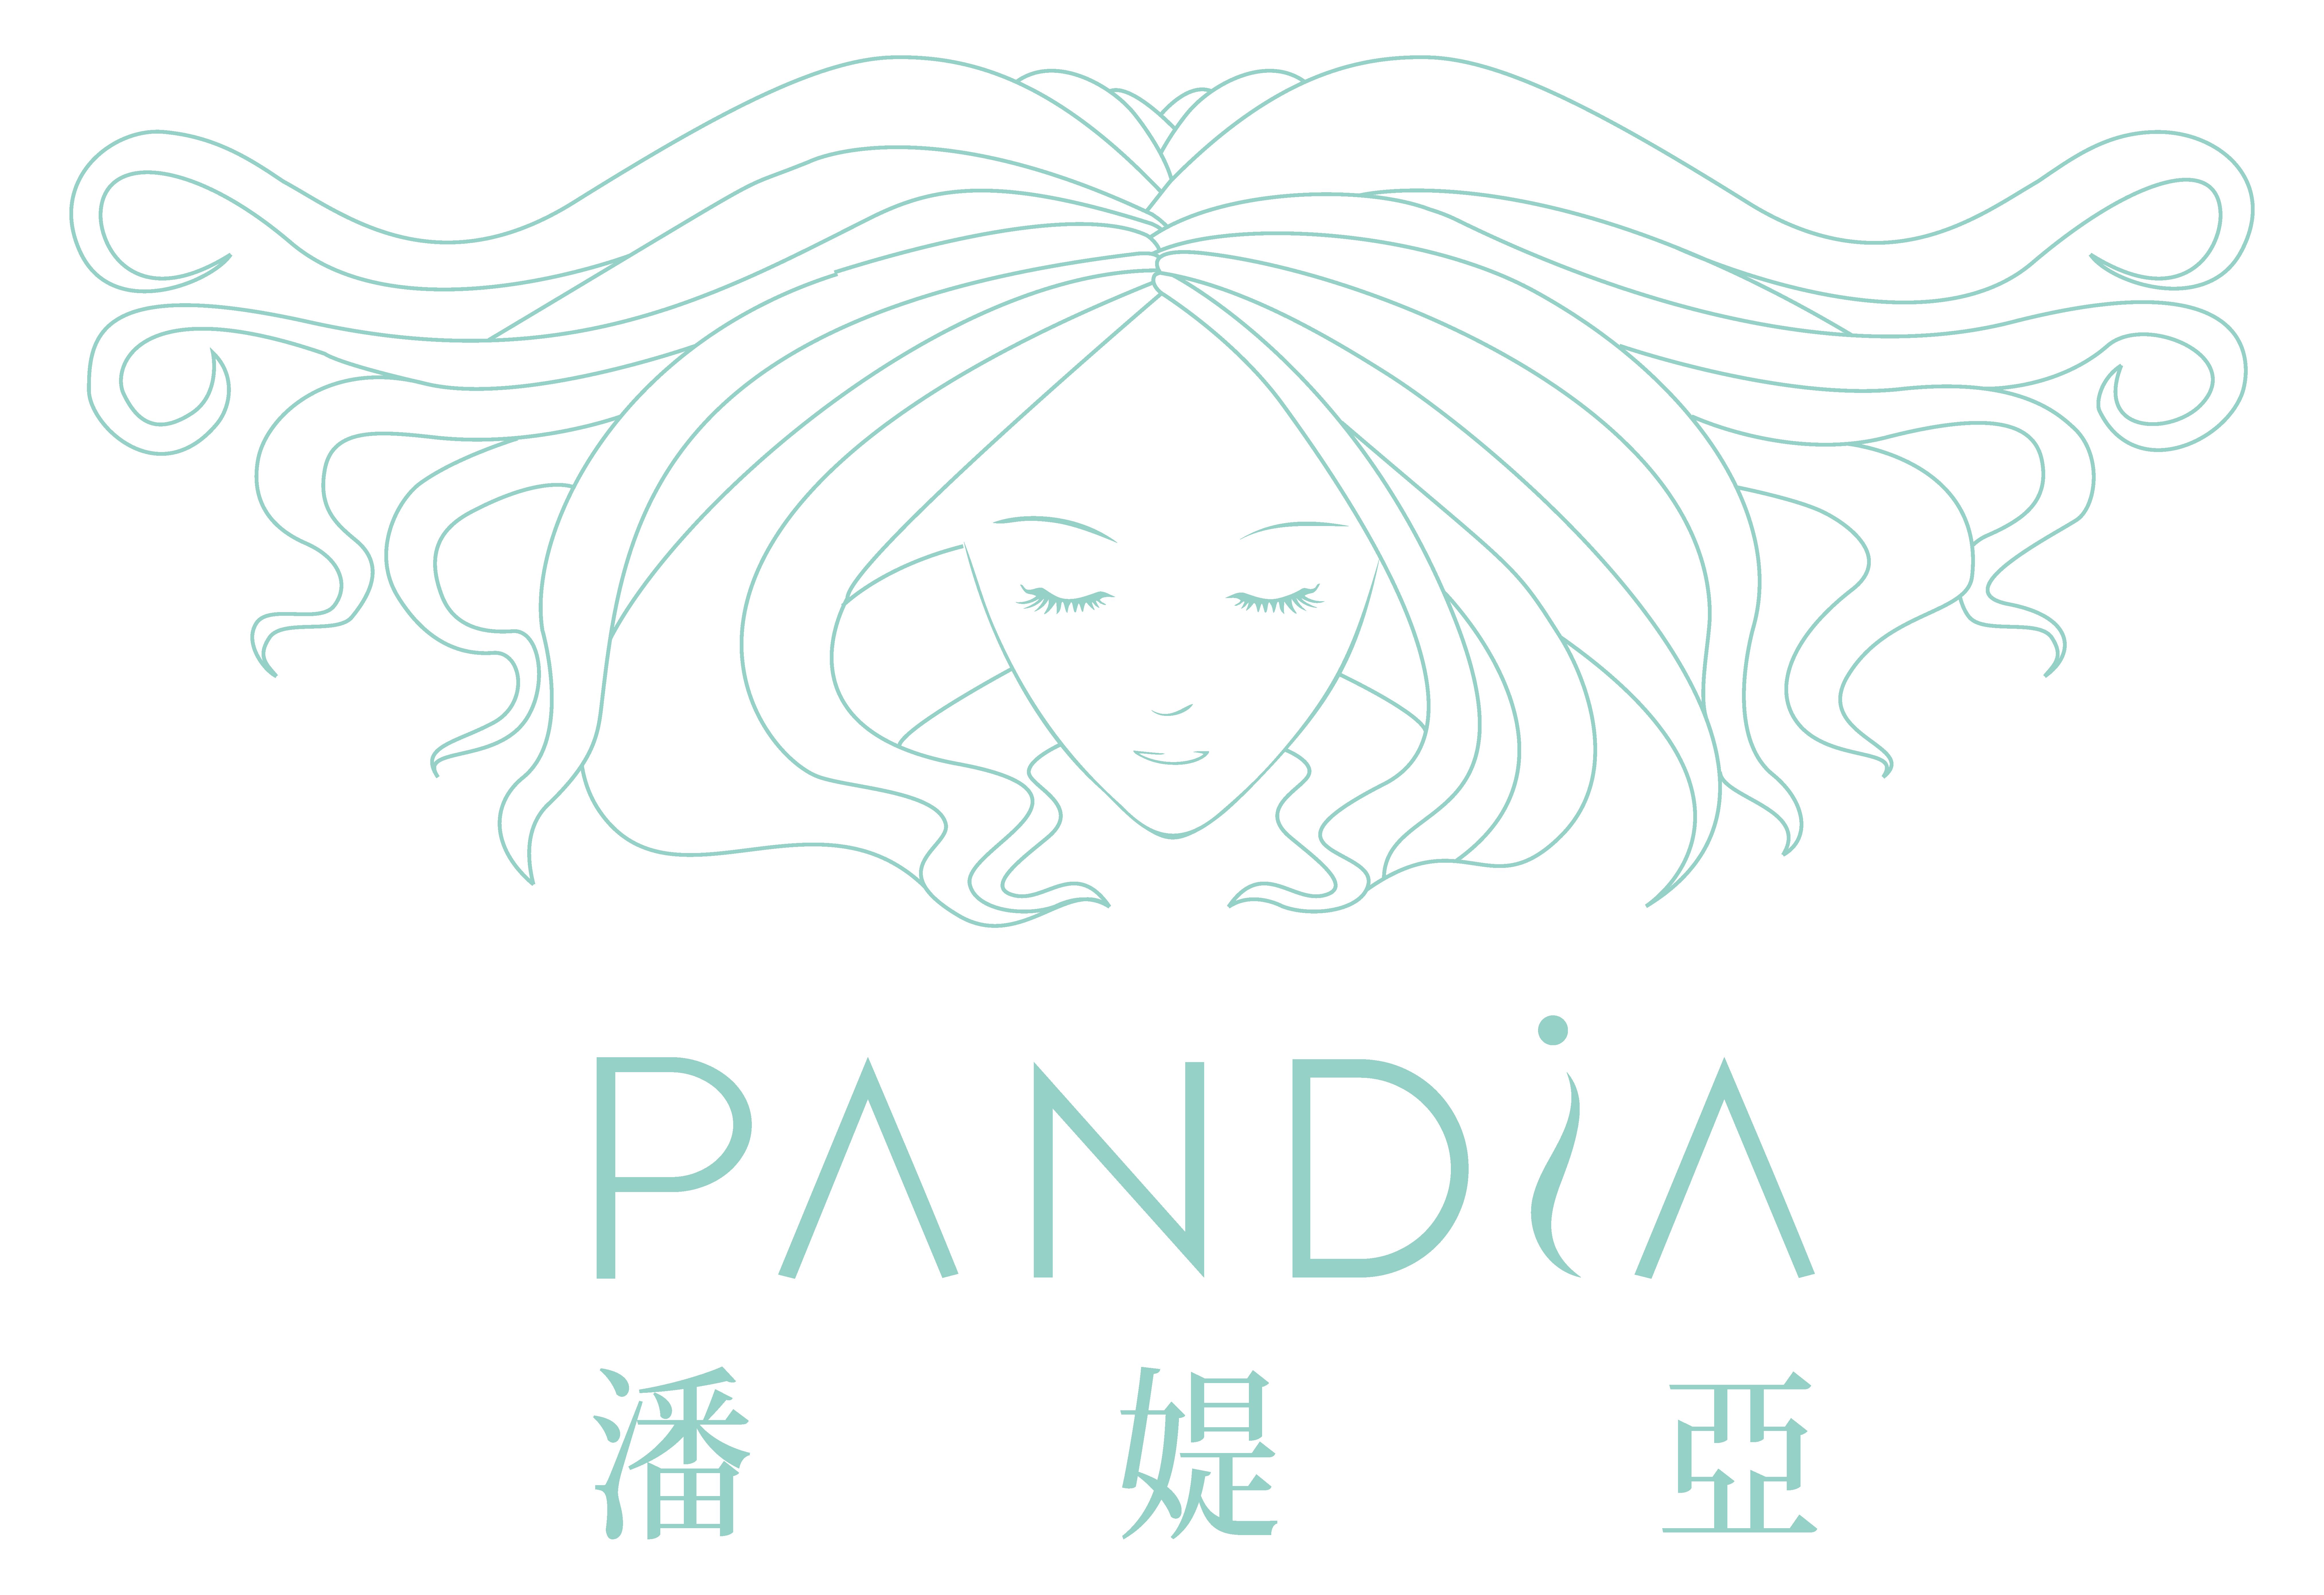 PANDIA 潘媞亞